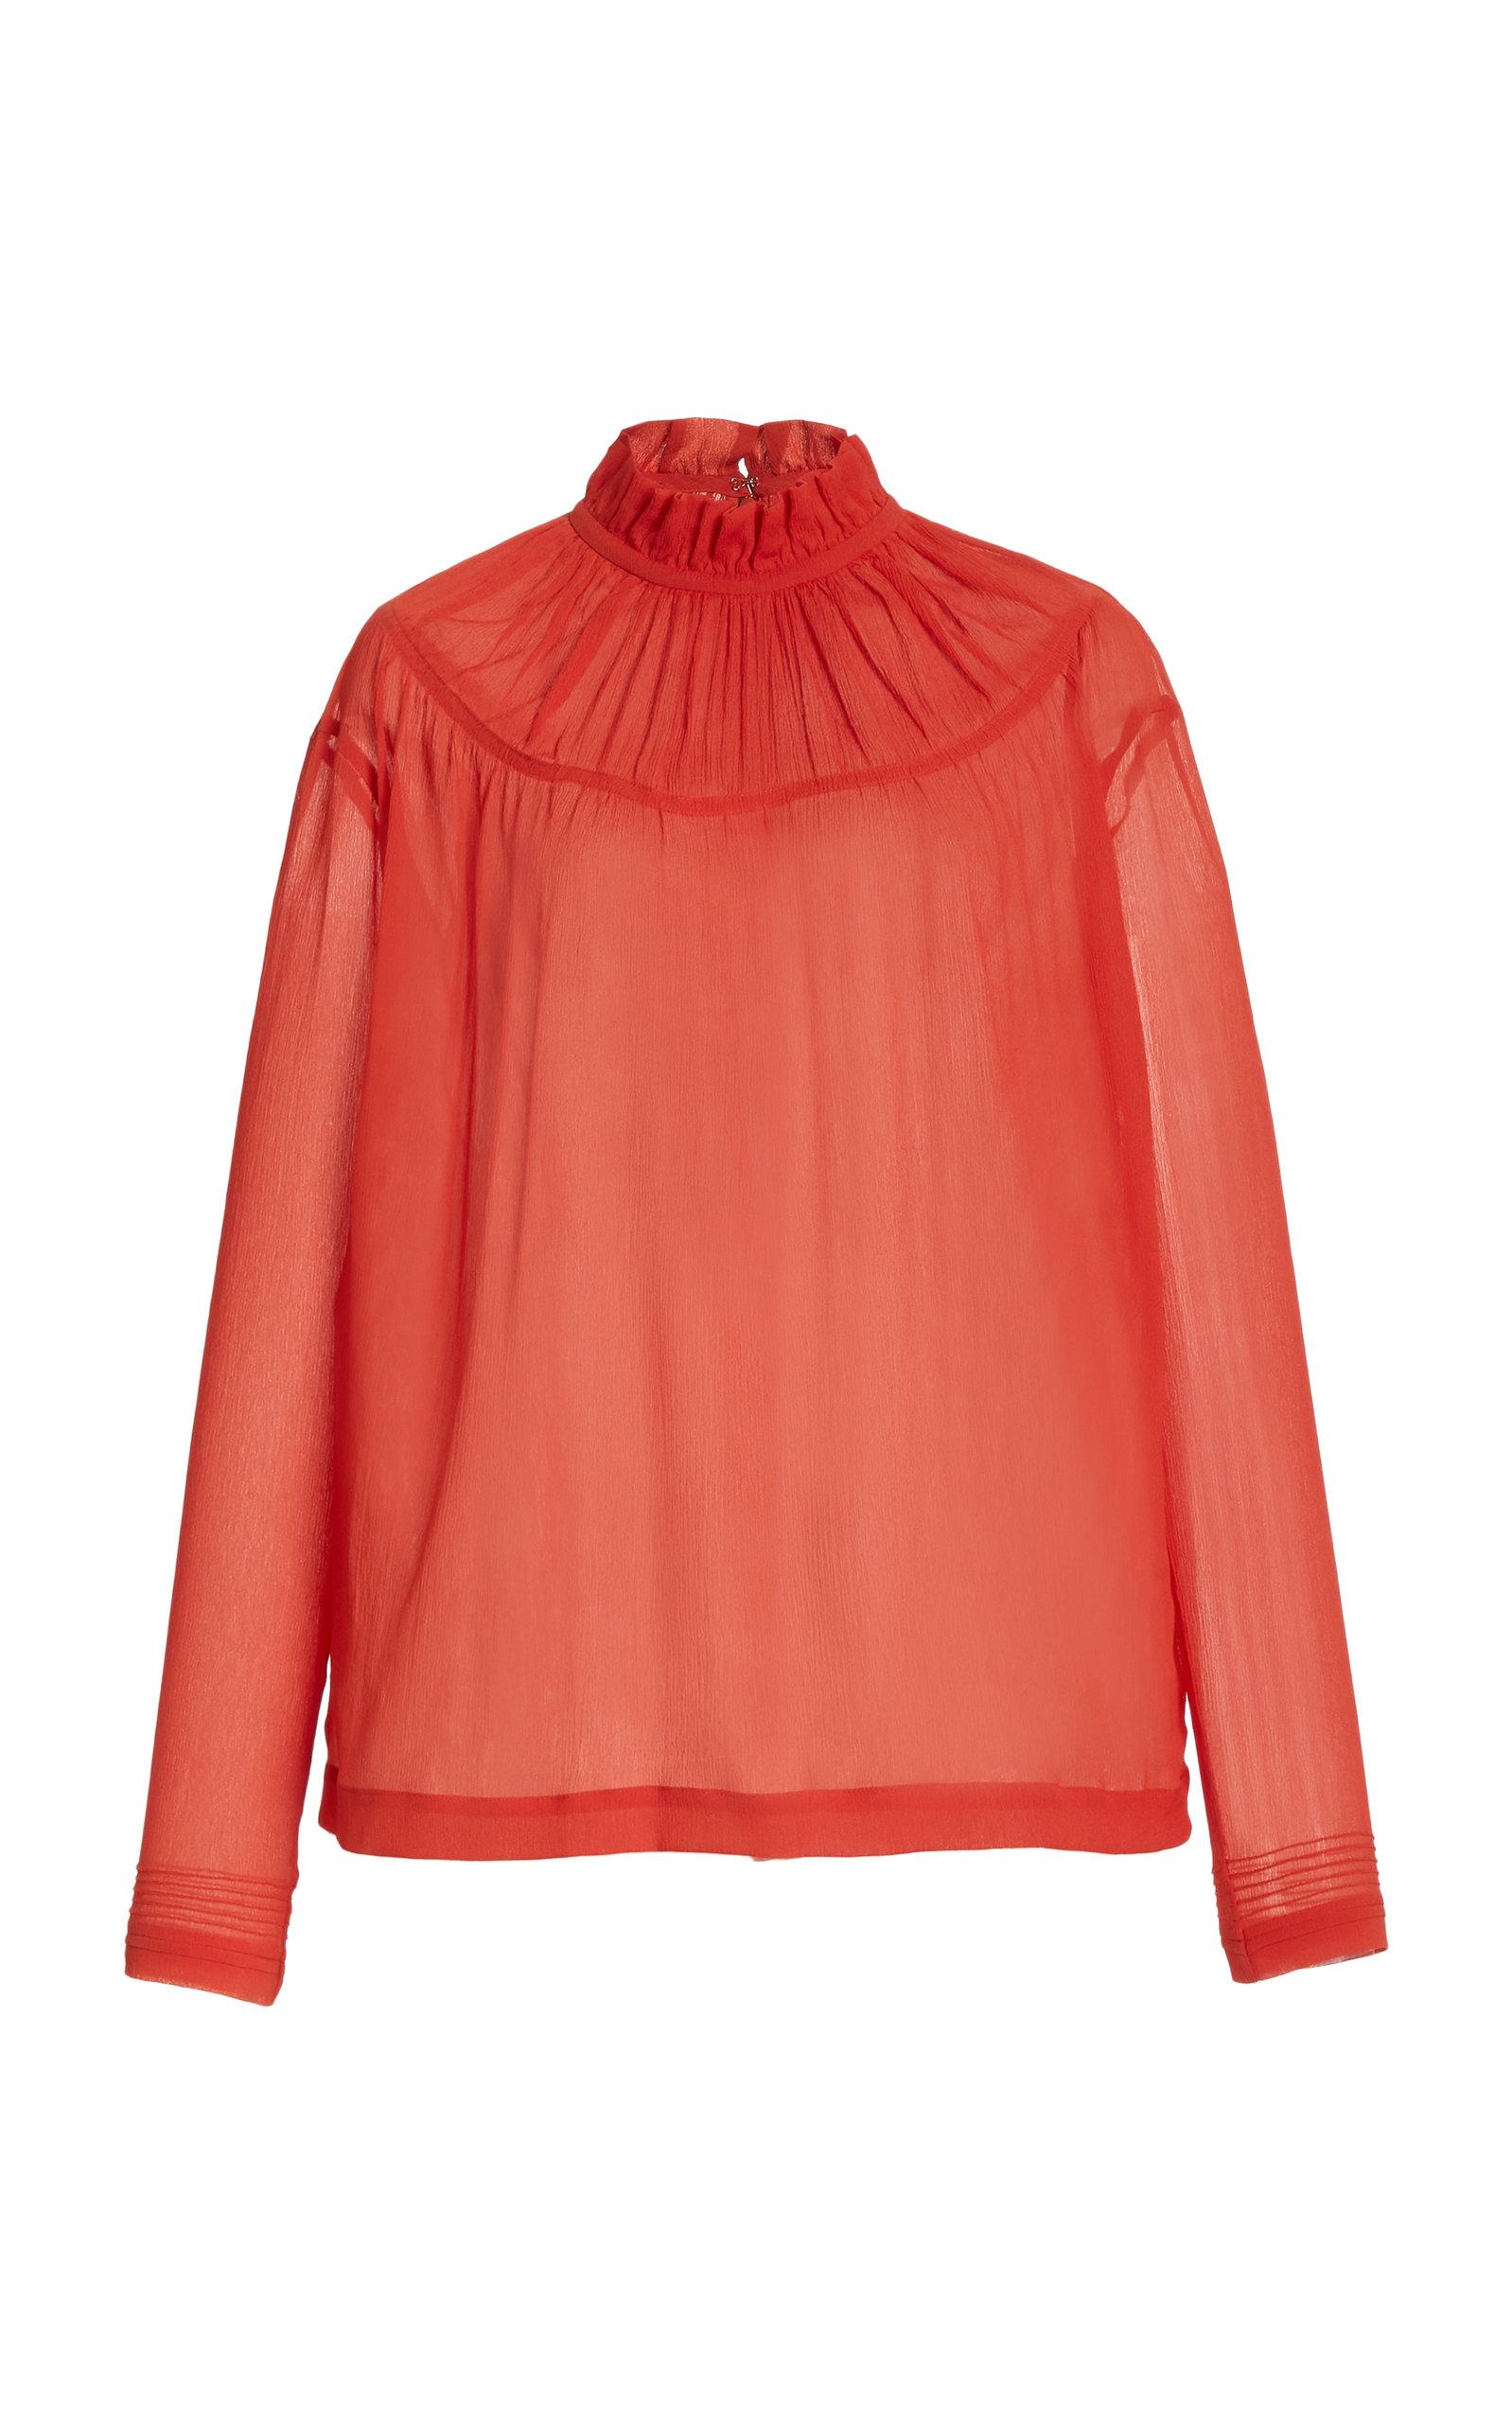 Victoria Victoria Beckham Pin Tuck-detail Ruffle Crepon Top In Orange